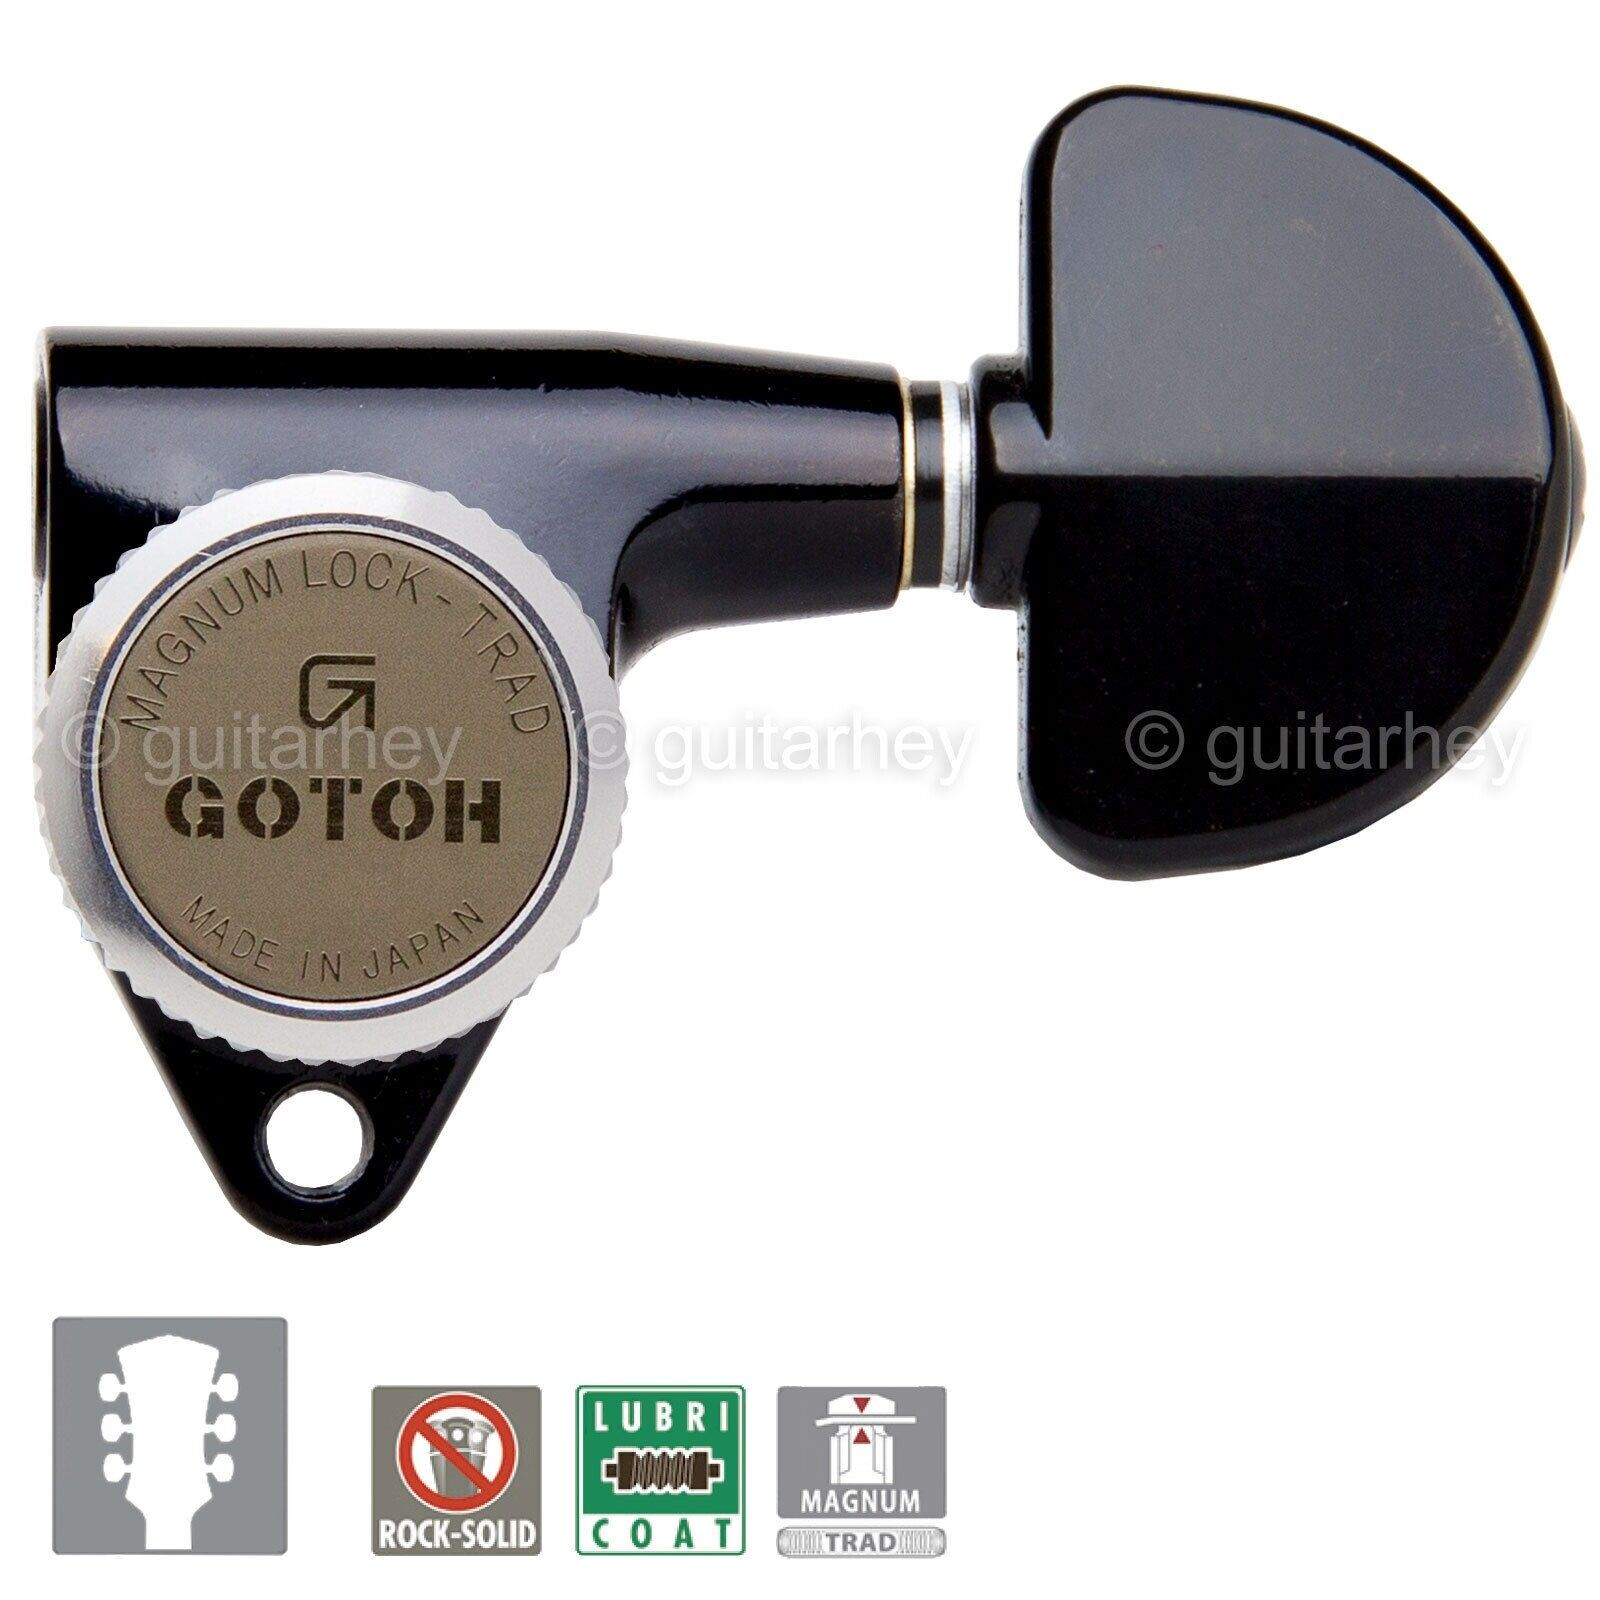 NEW Gotoh SG301-20 MGT Magnum Lock Trad Locking L3+R3 Tuning Keys 3x3 - schwarz